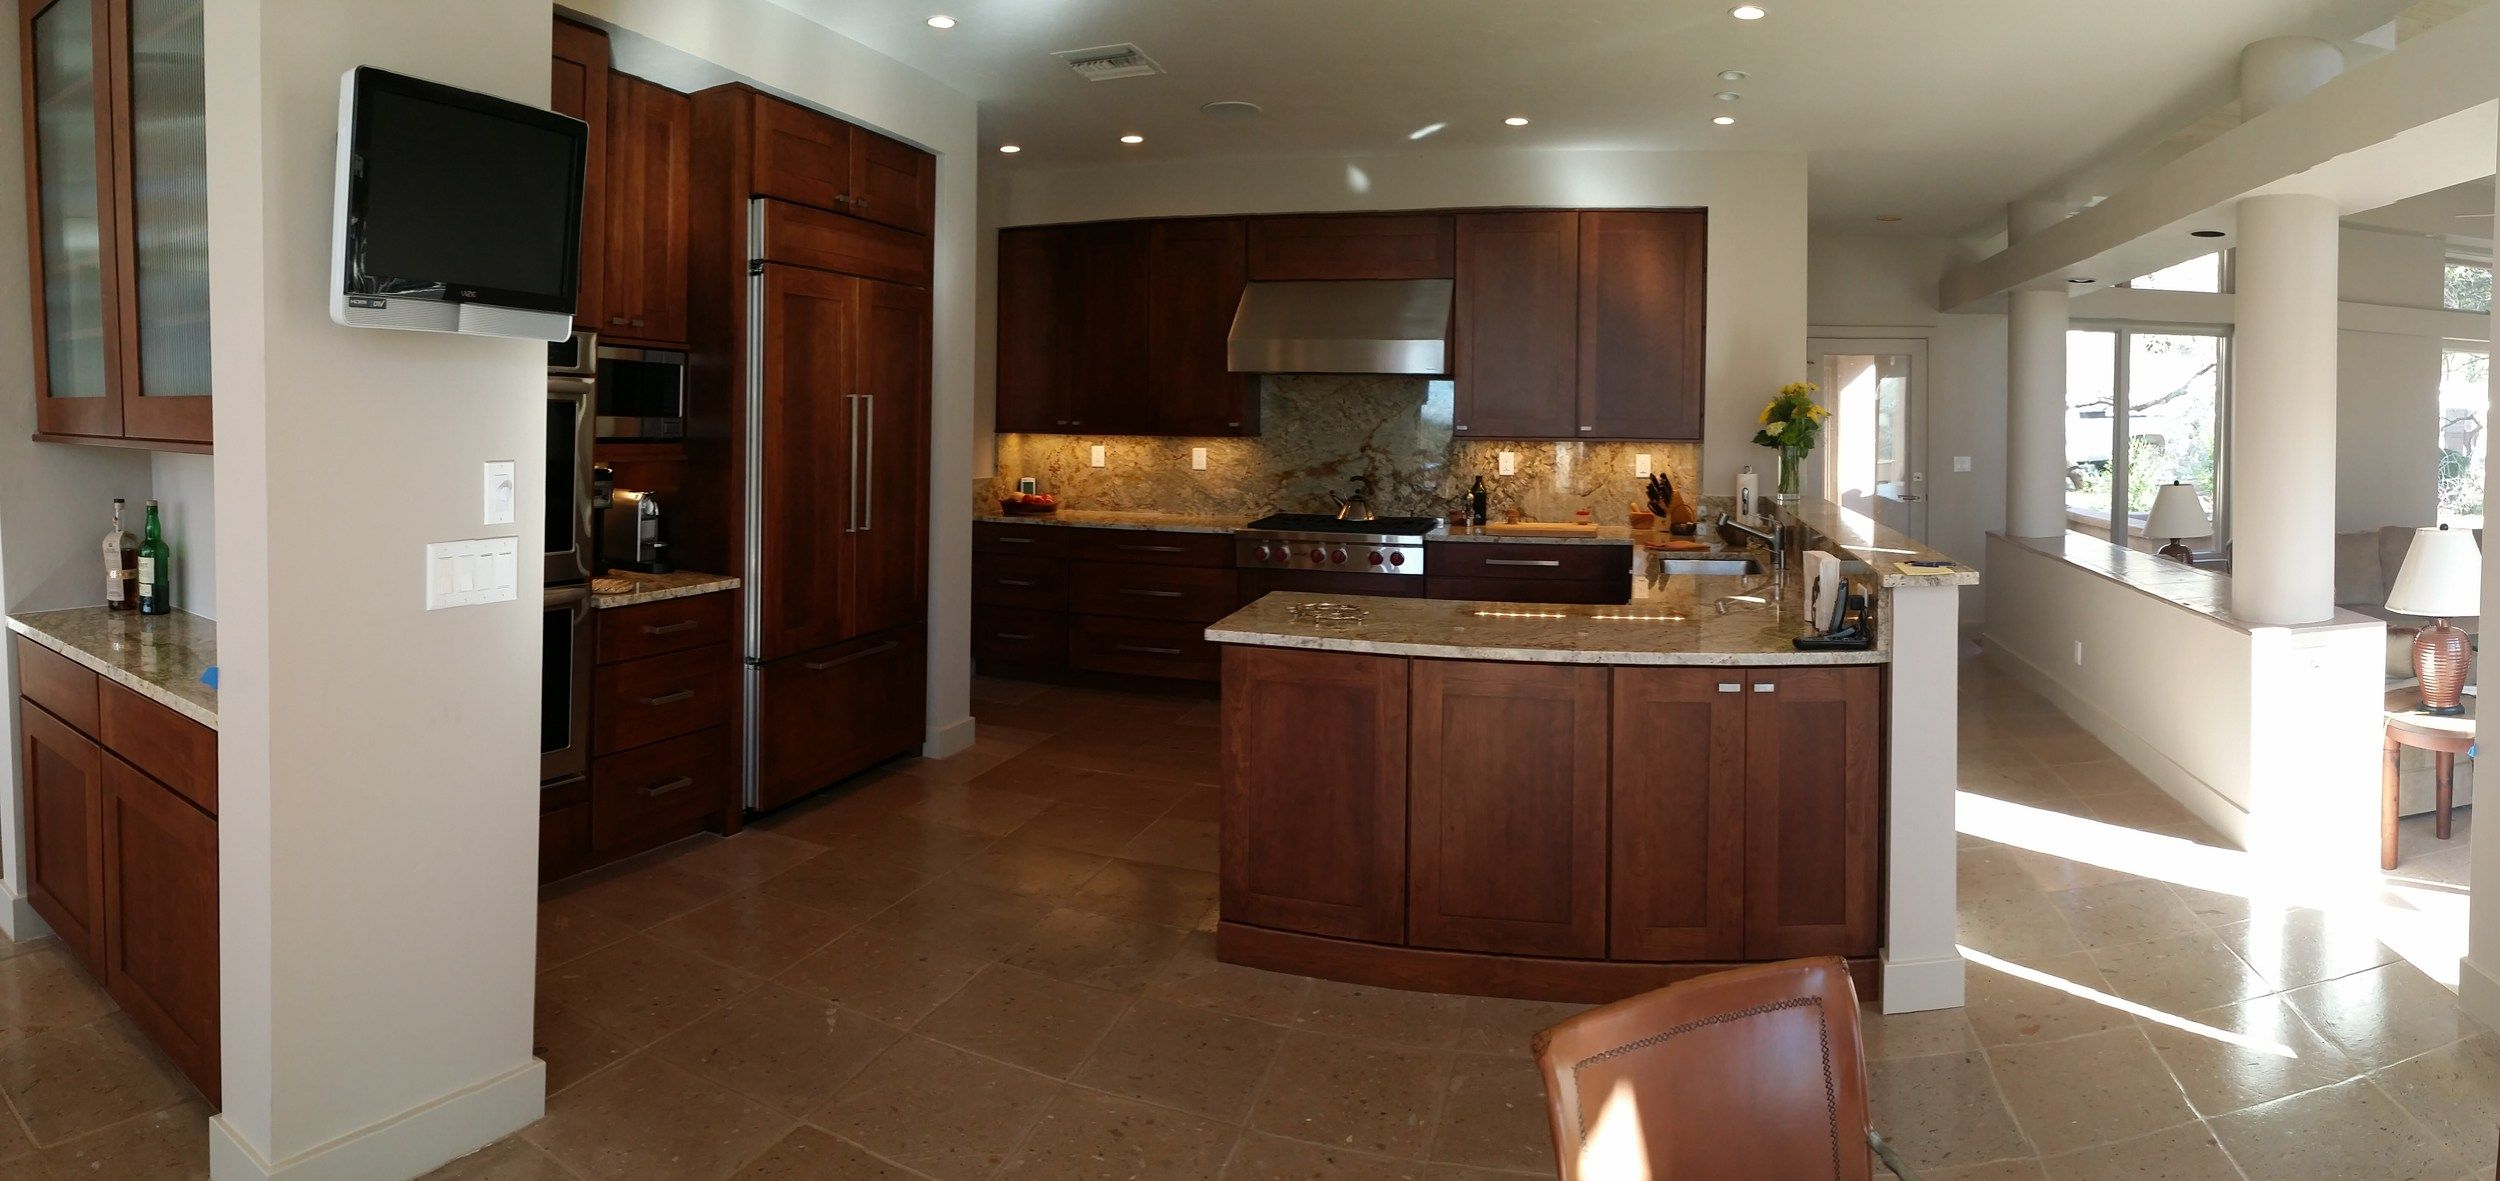 Atemberaubende Tucson Az Küche Umbau Dusche renovieren